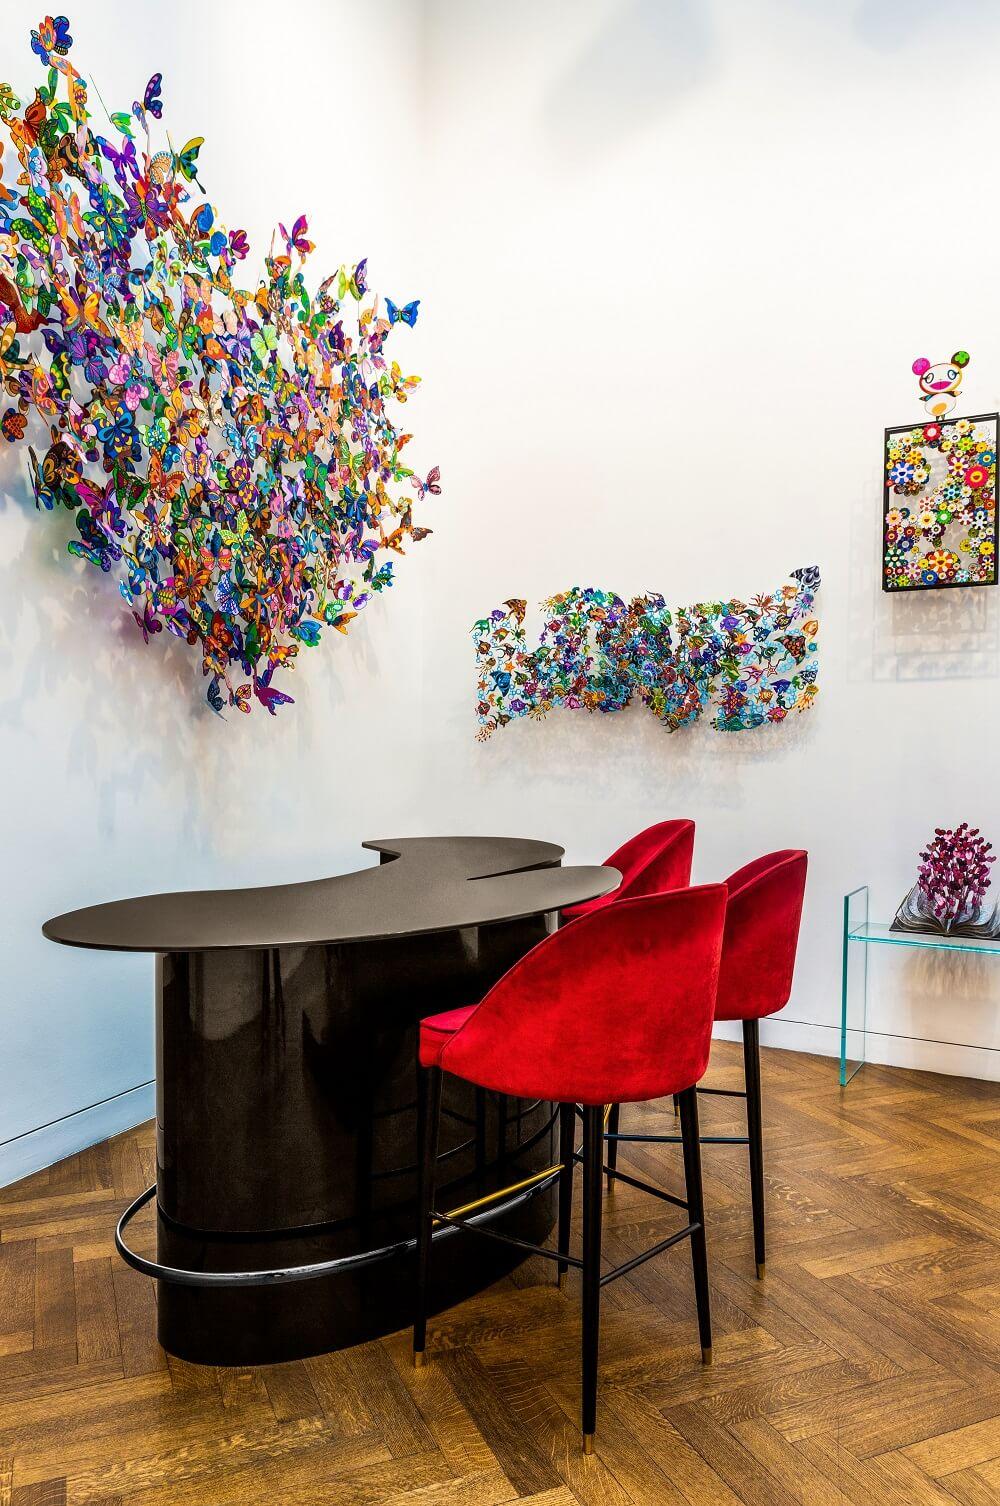 David Kracov - Eden Fine Art Gallery- Celebrating International Artists Day